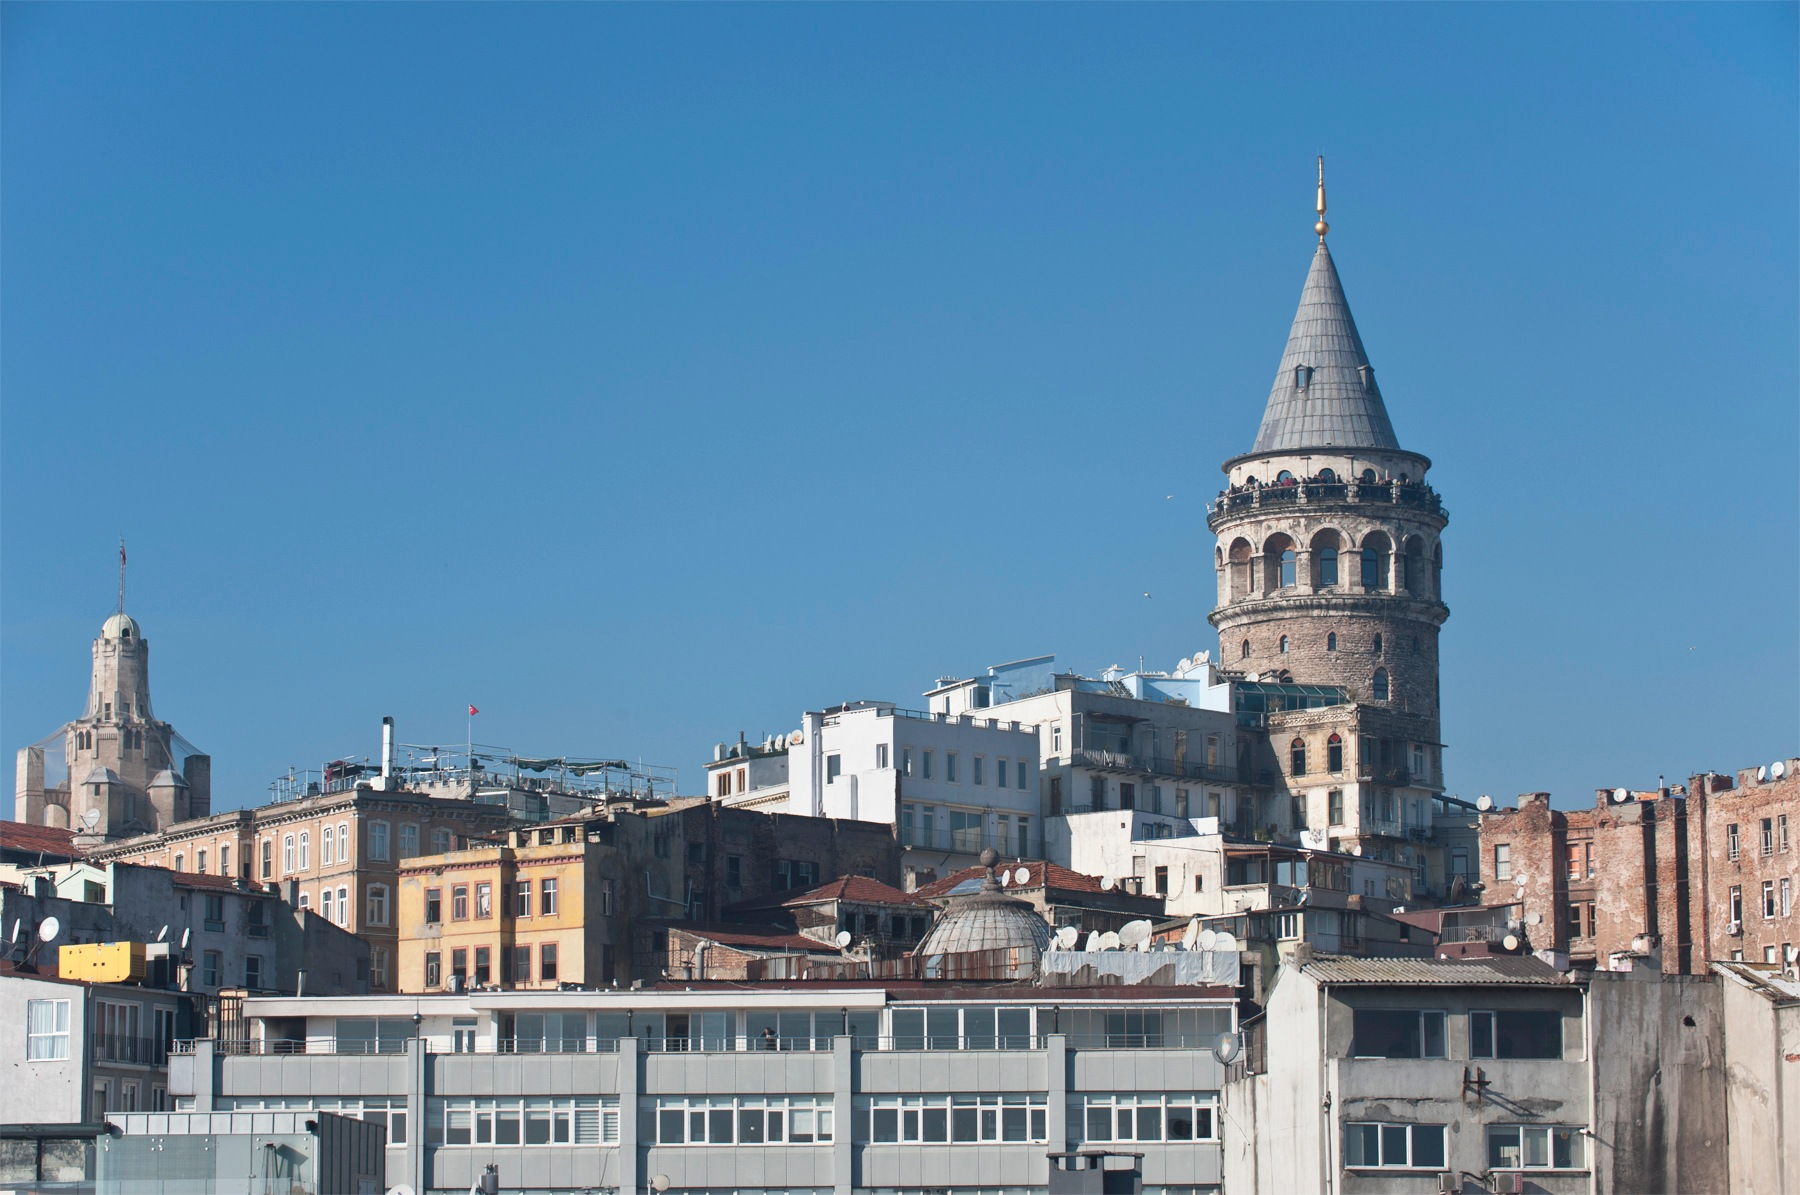 Galata Tower by Mehmet Talu Uray